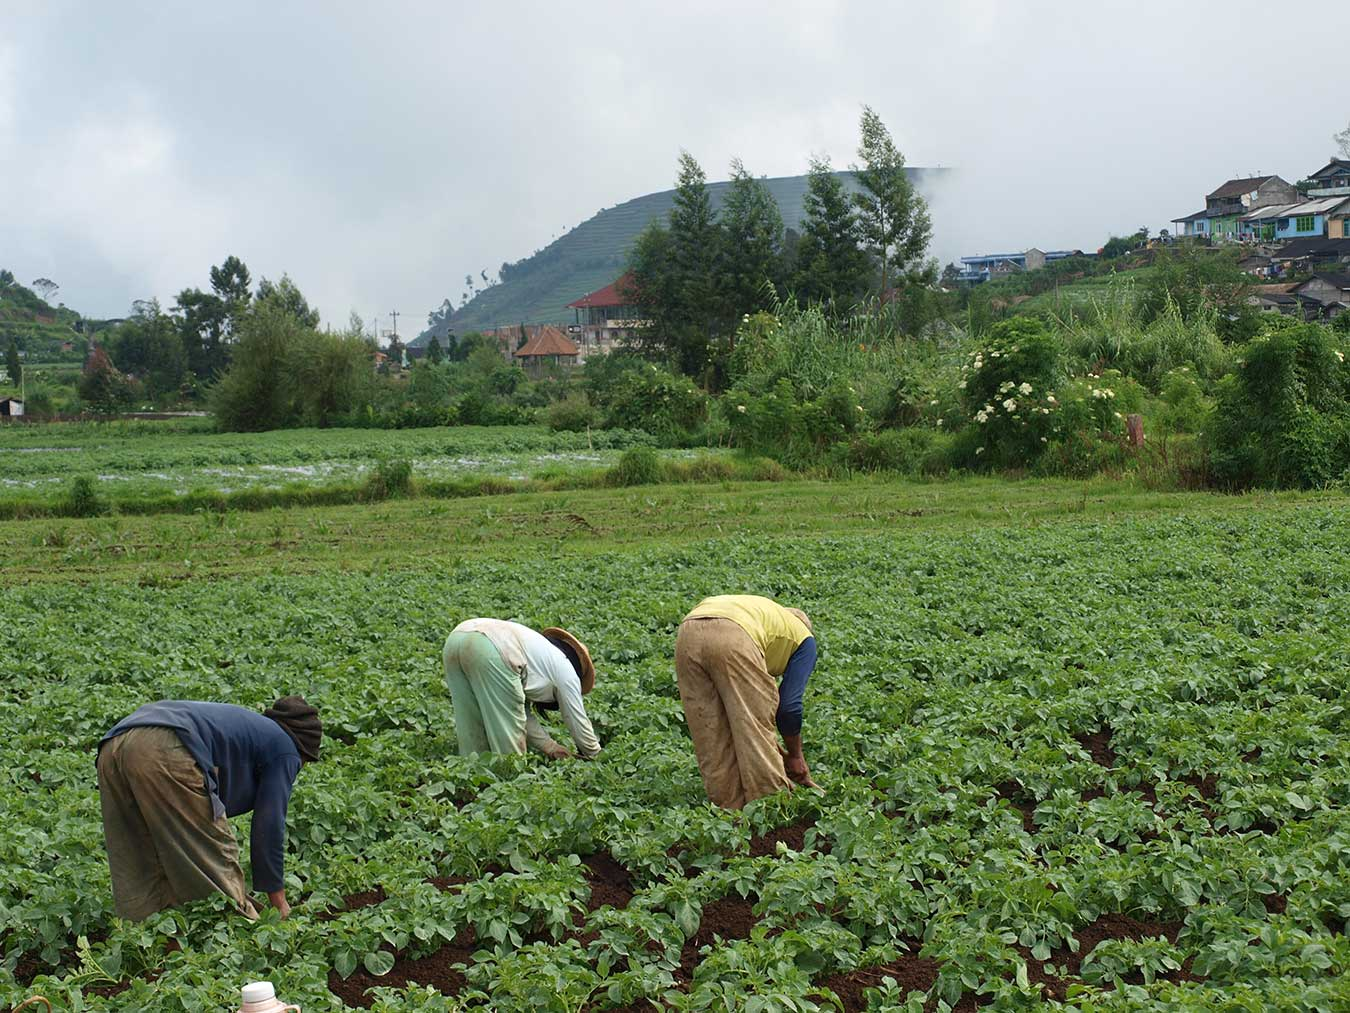 Image of farmers in a field